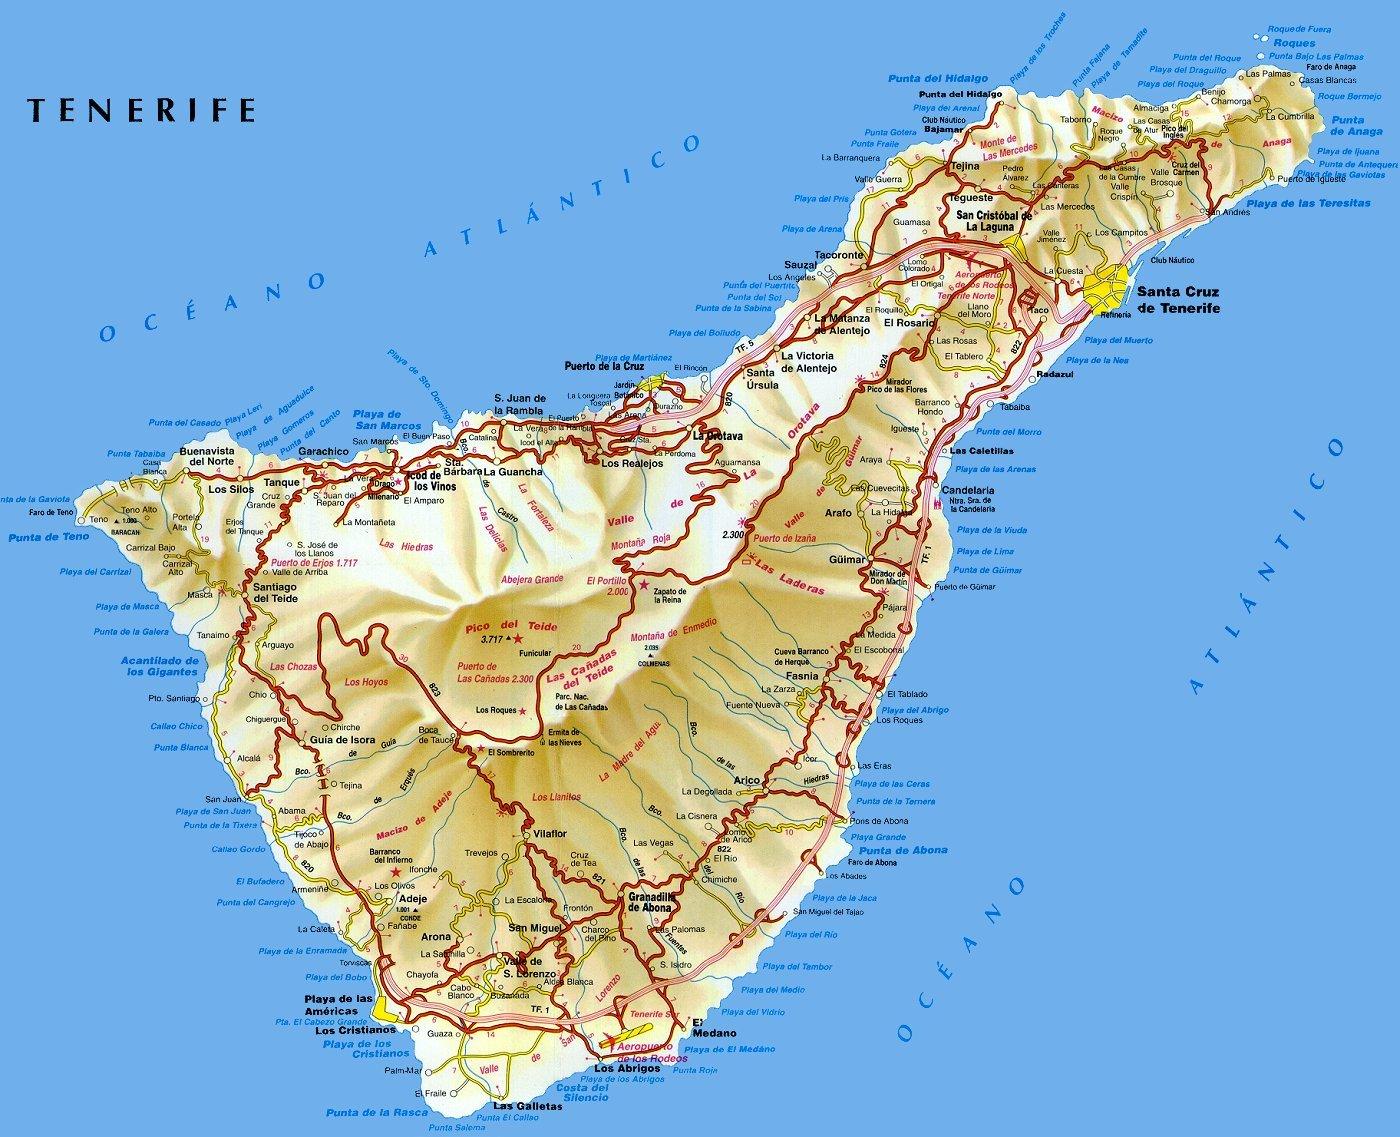 Отдых на острове Тенерифе, туры на Тенерифе 2017 ...